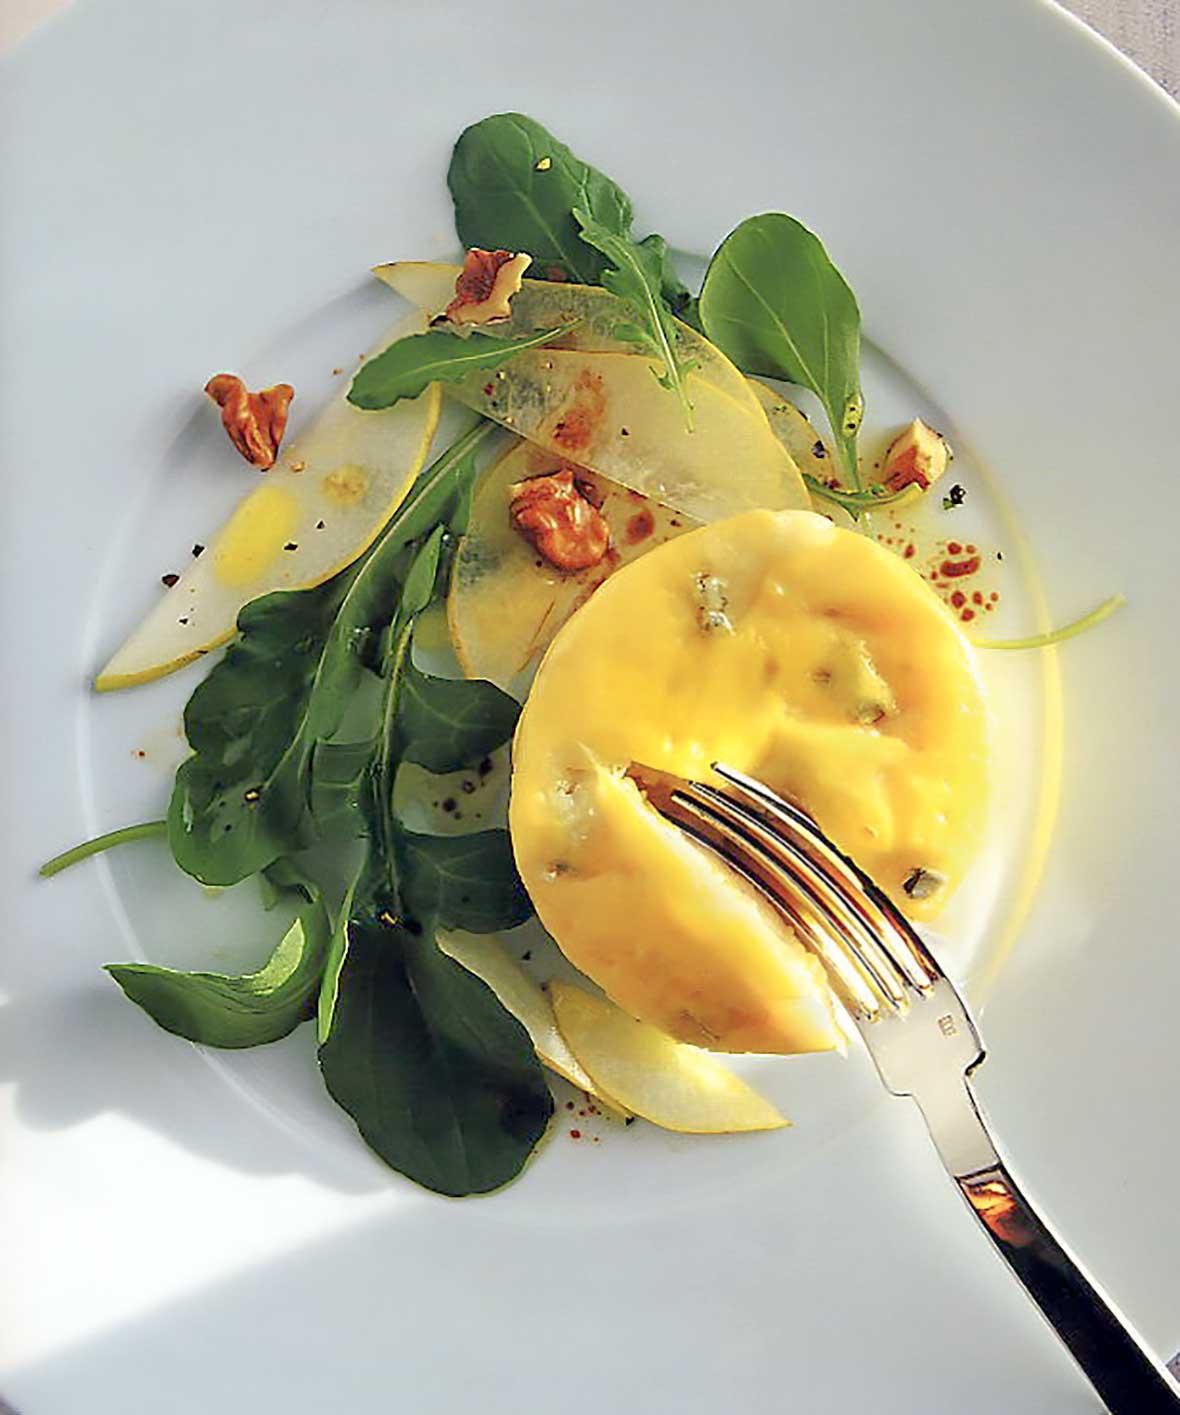 Gorgonzola Custards with Pears